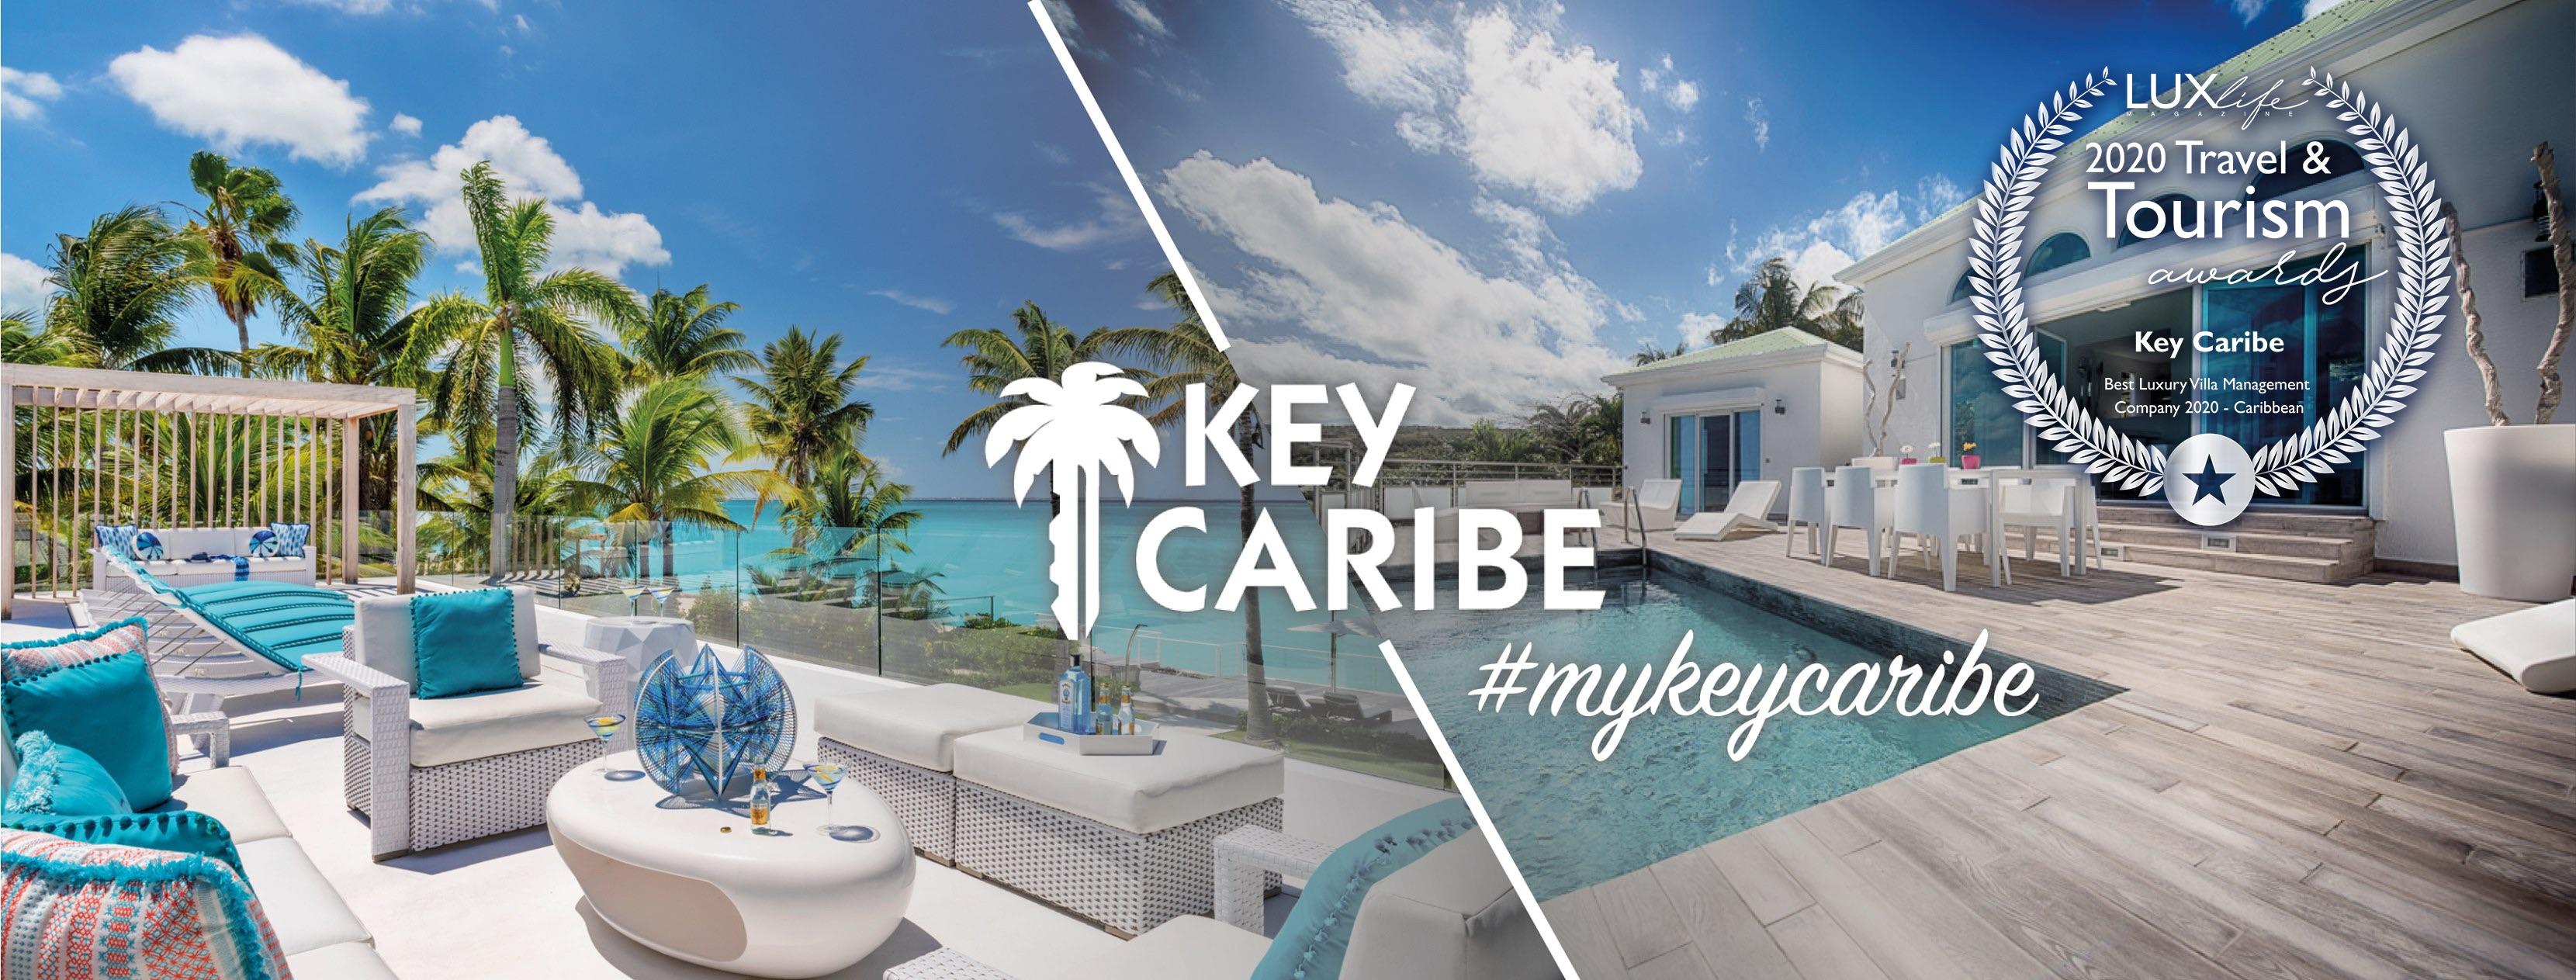 Key Caribe Caribbean Luxury Vacation Rental Villas